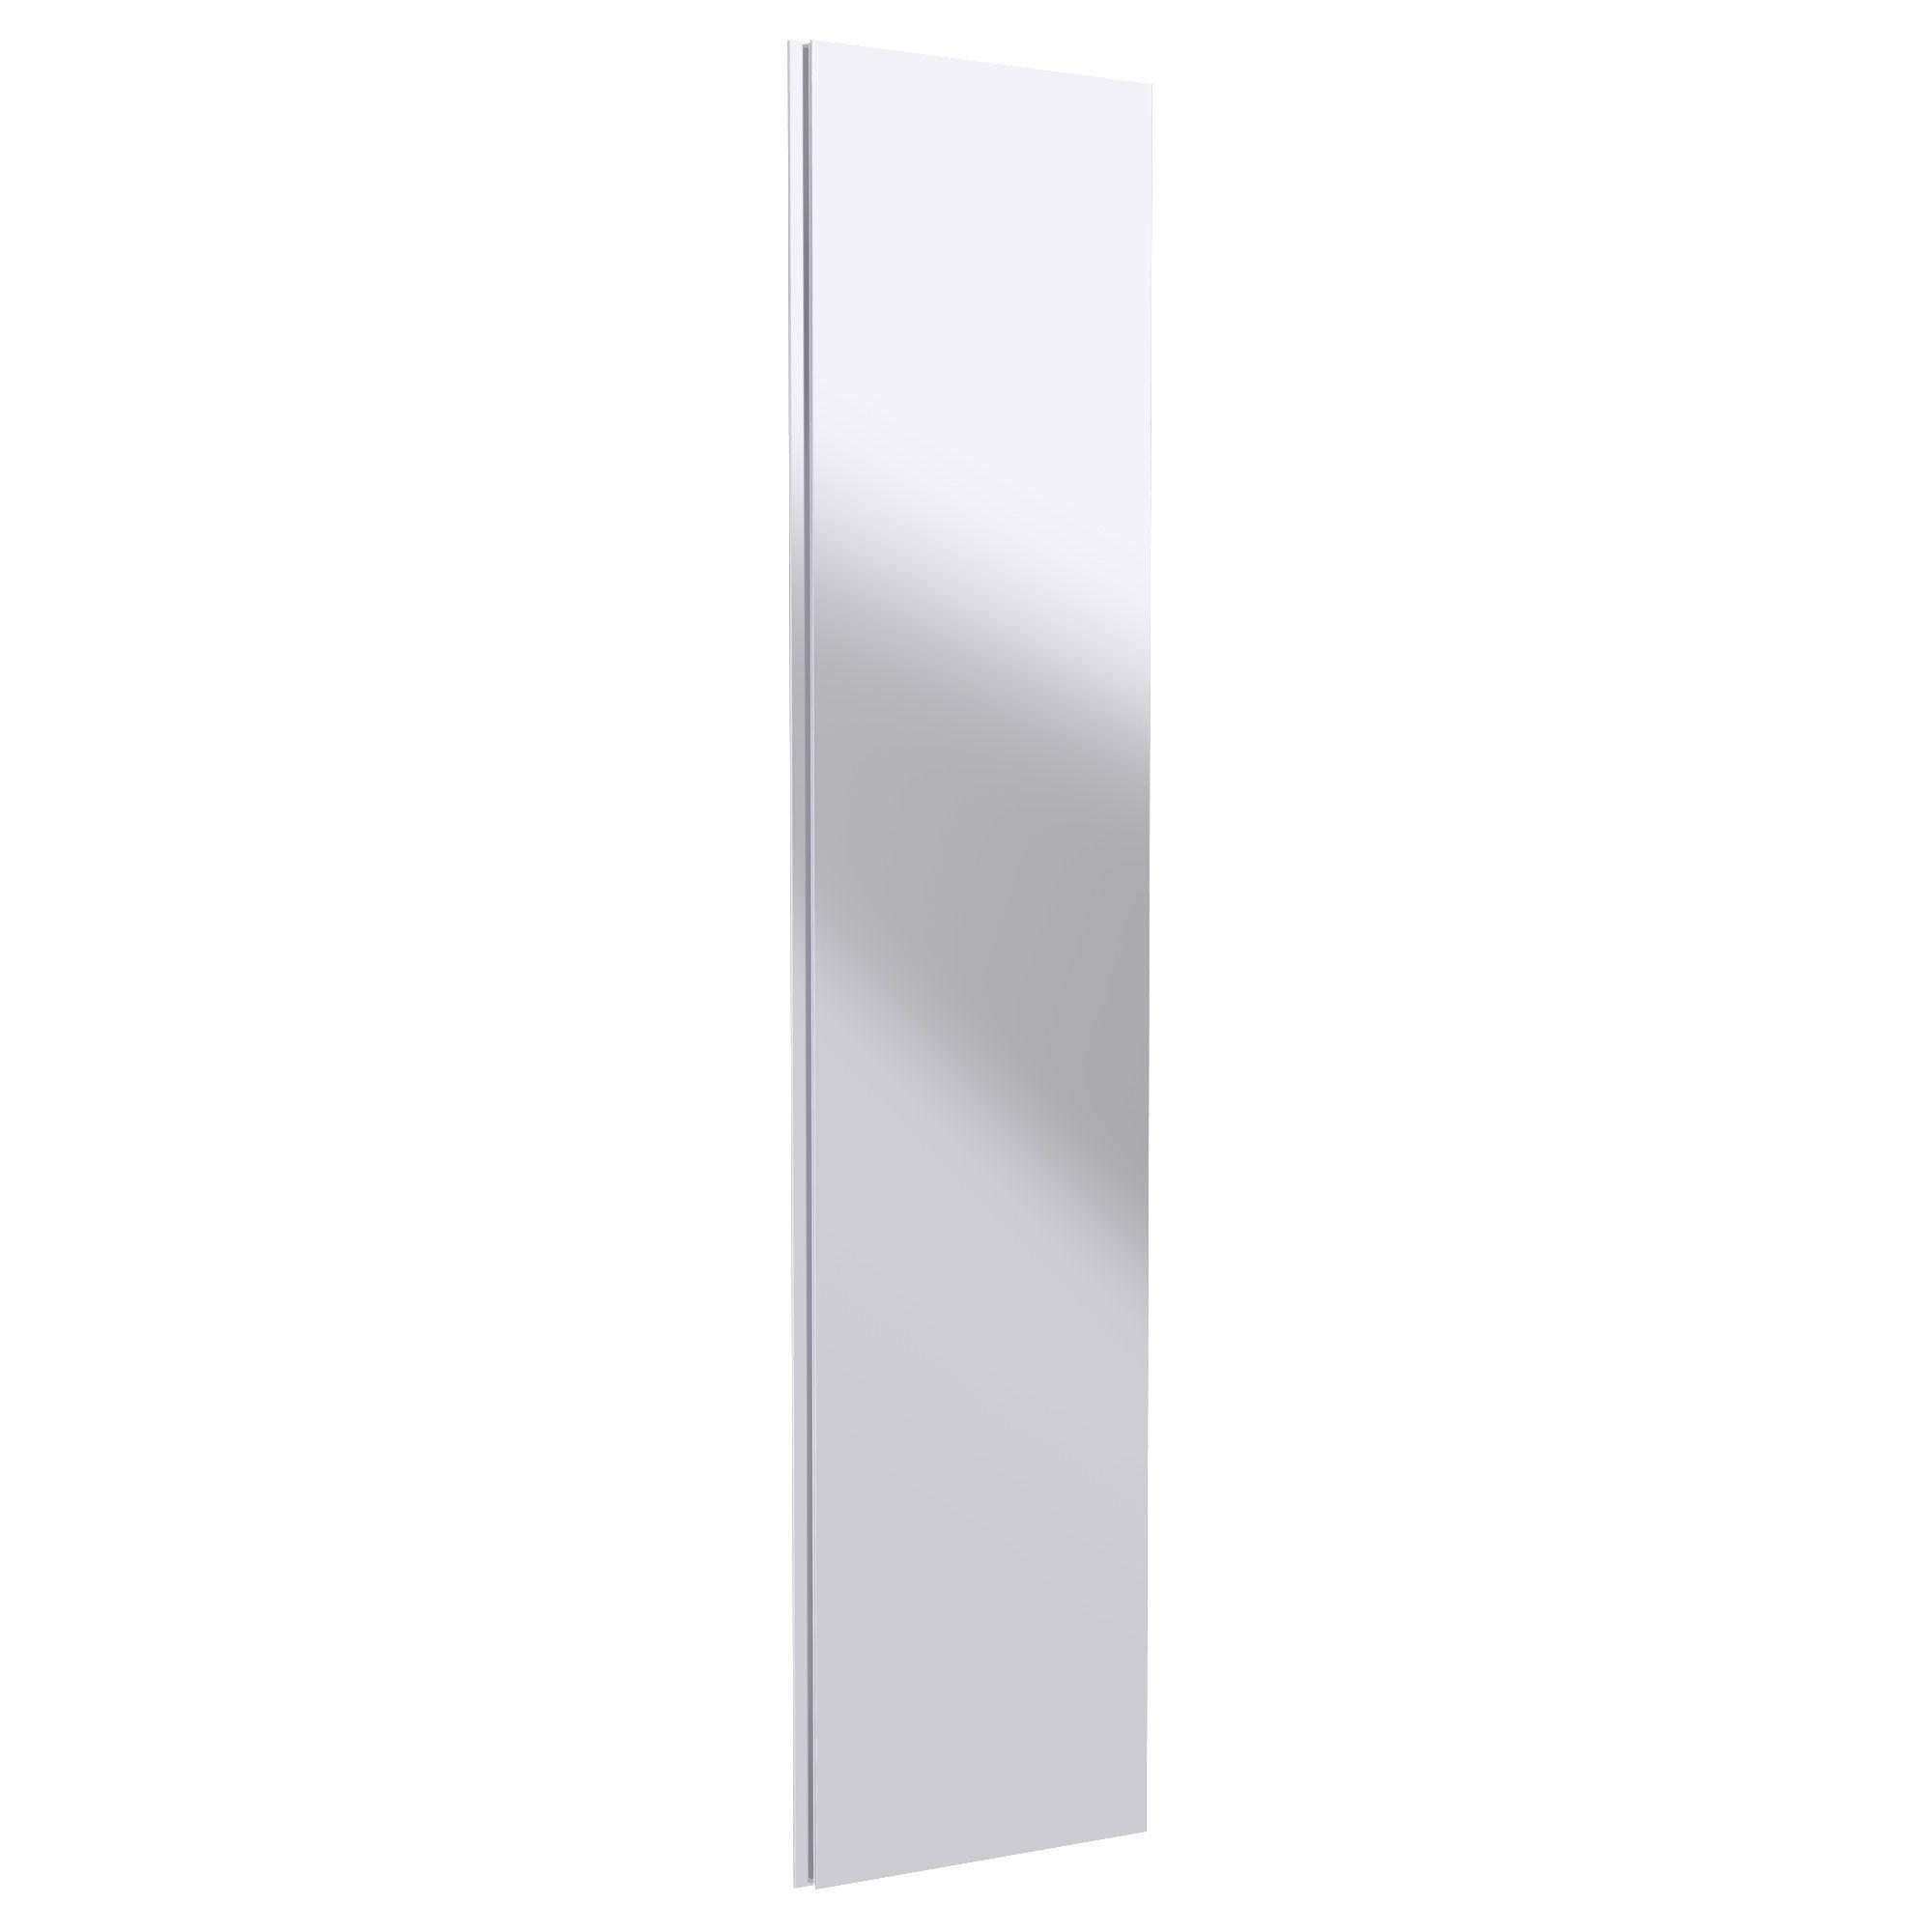 Darwin Modular Large Wardrobe Door (h)2280mm (w)497mm